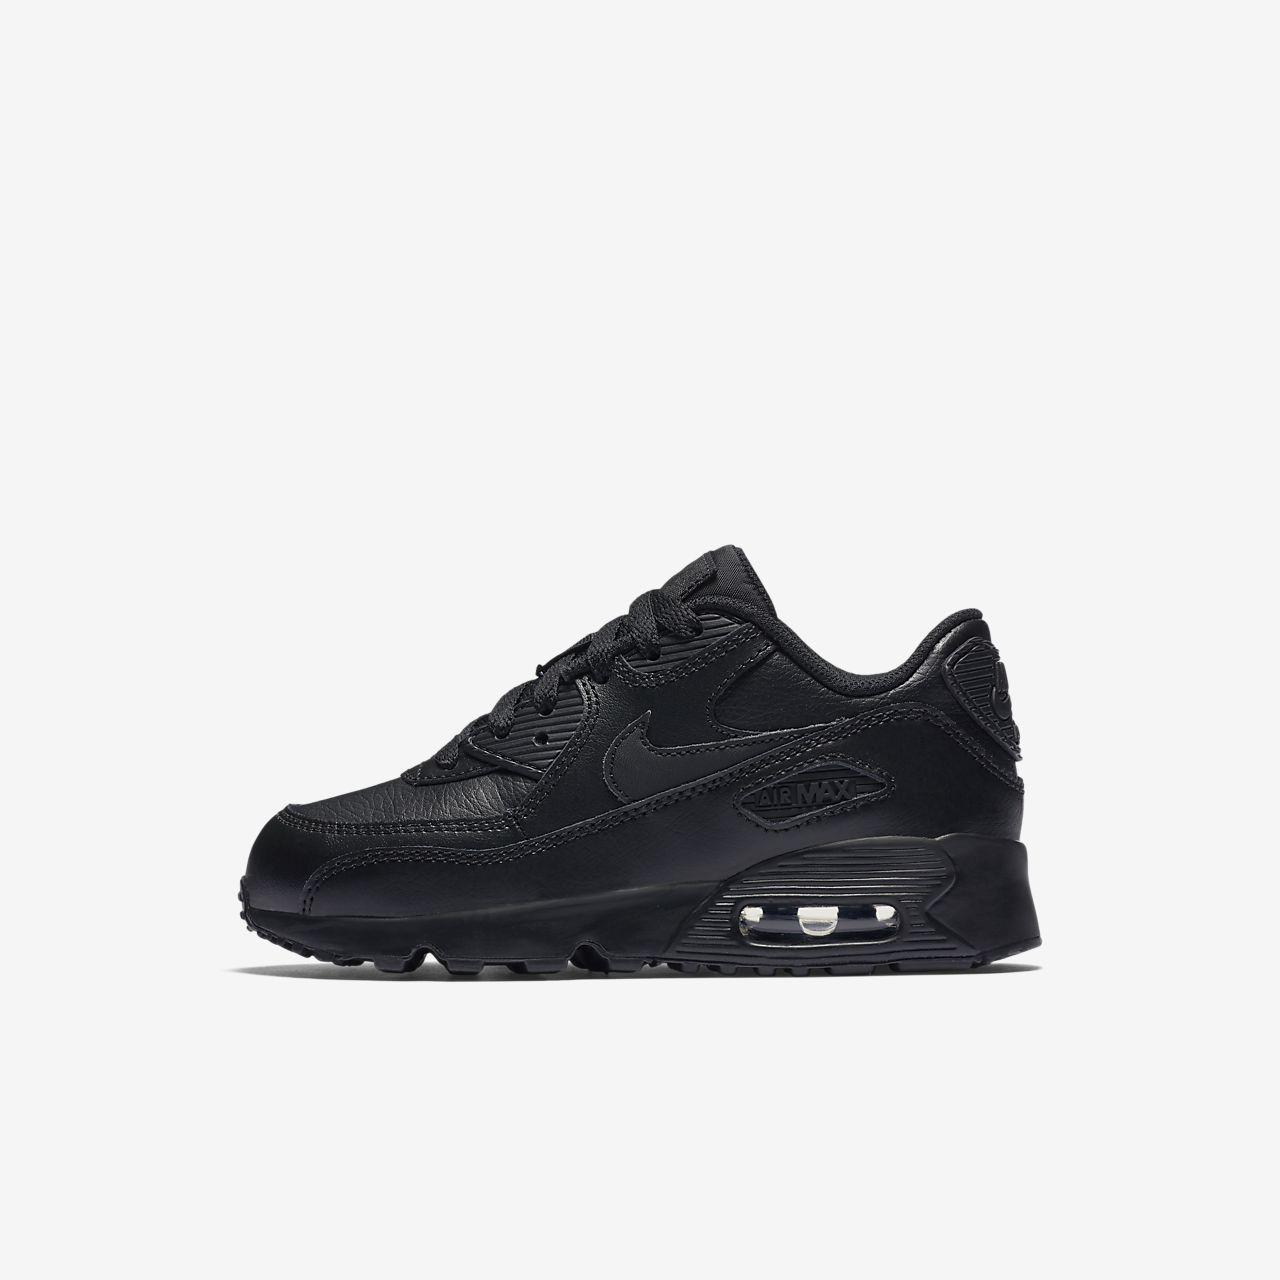 Bota Nike Air Max 90 Leather pro malé děti